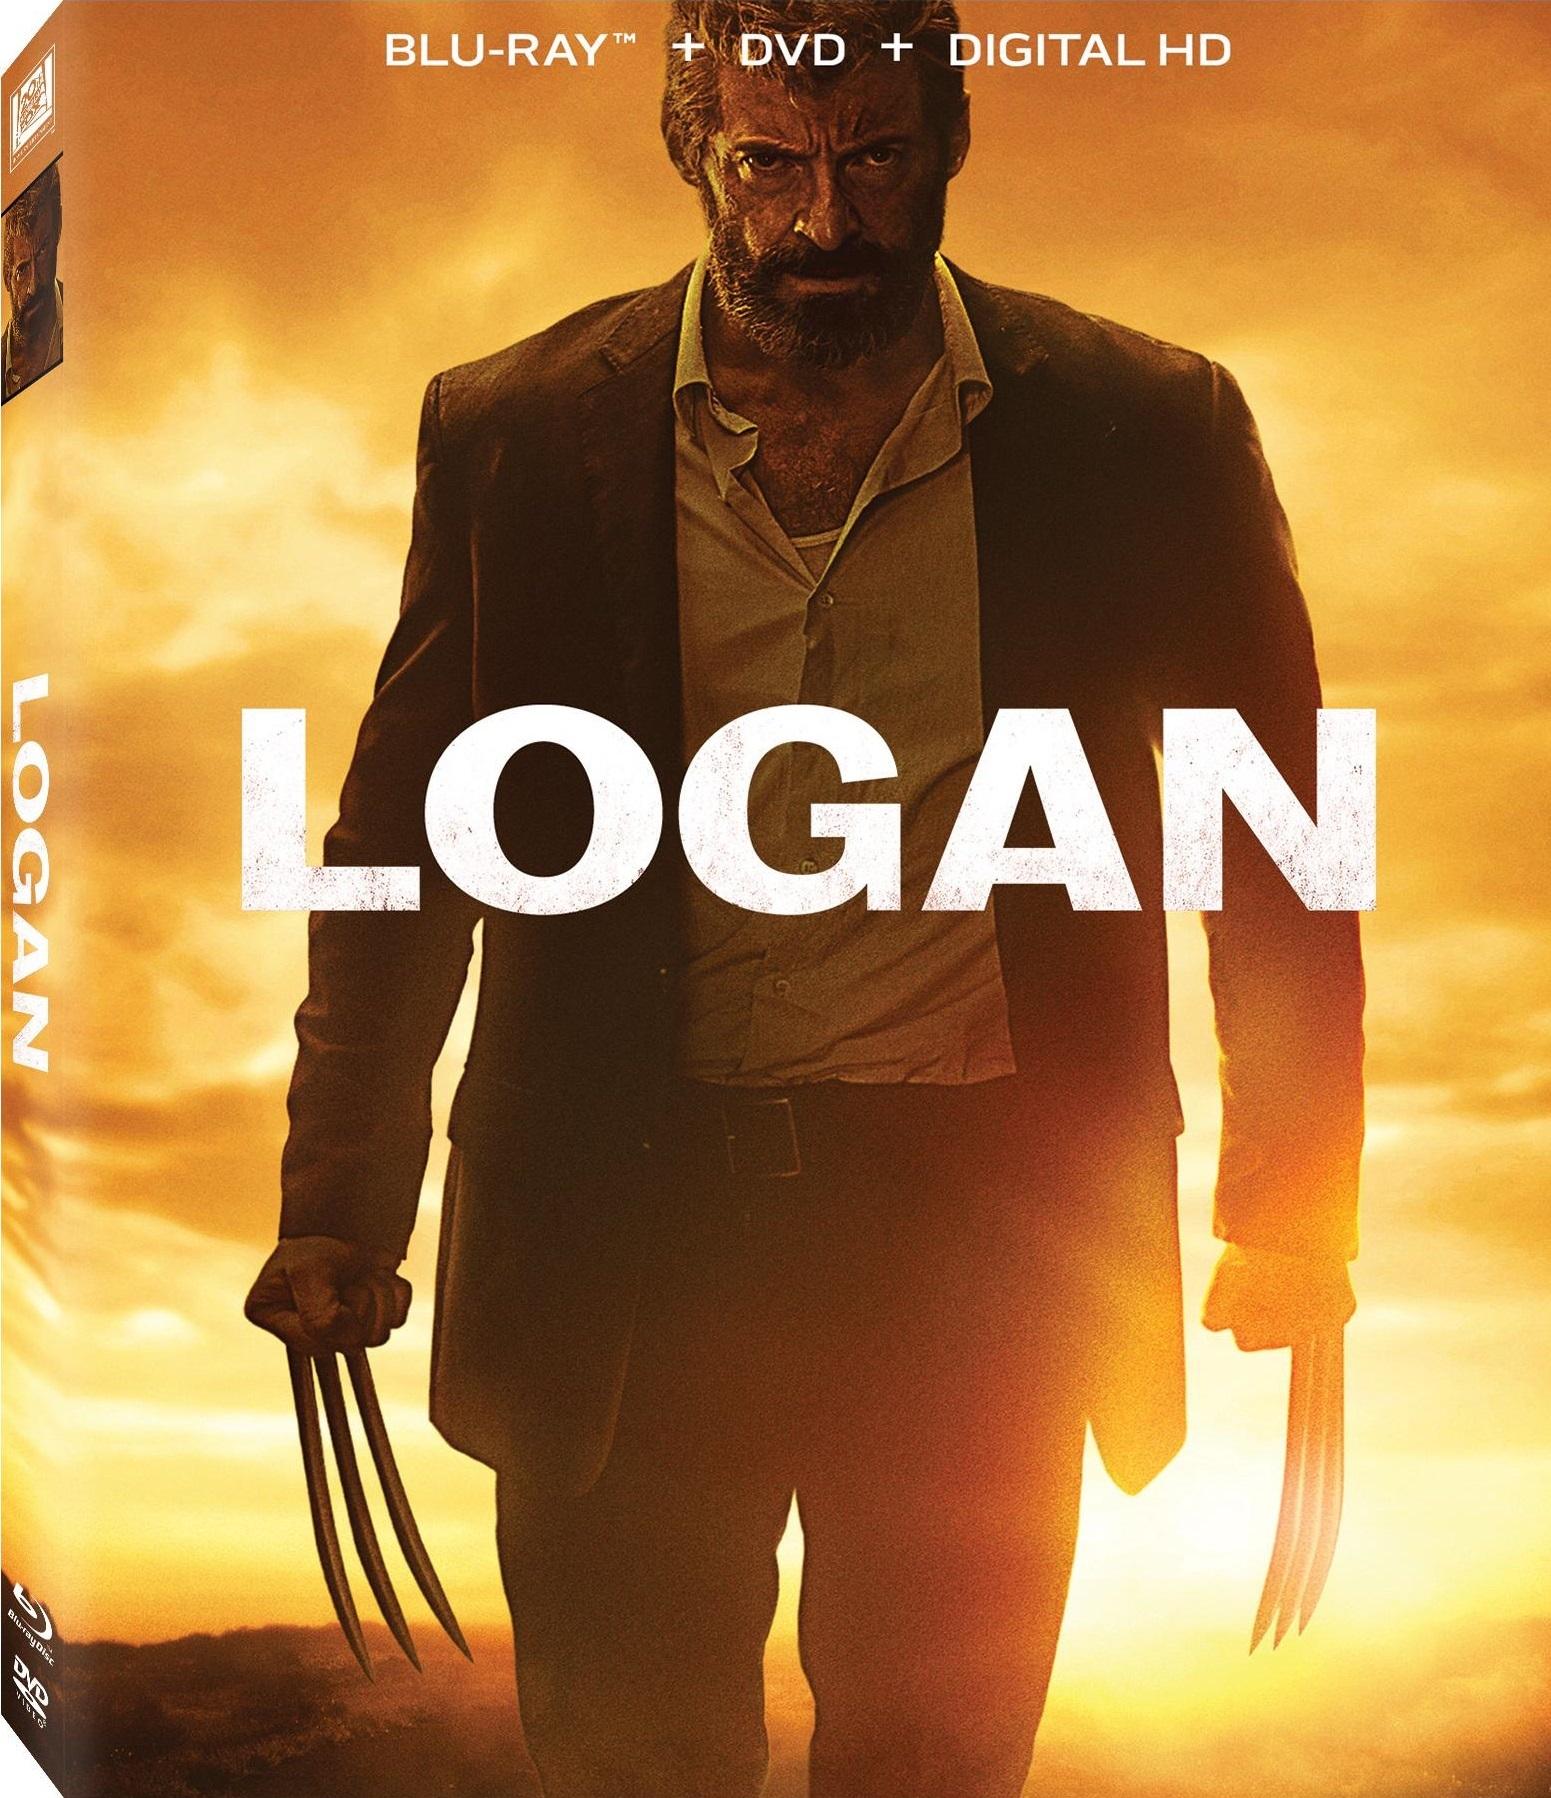 Logan (2017) poster image